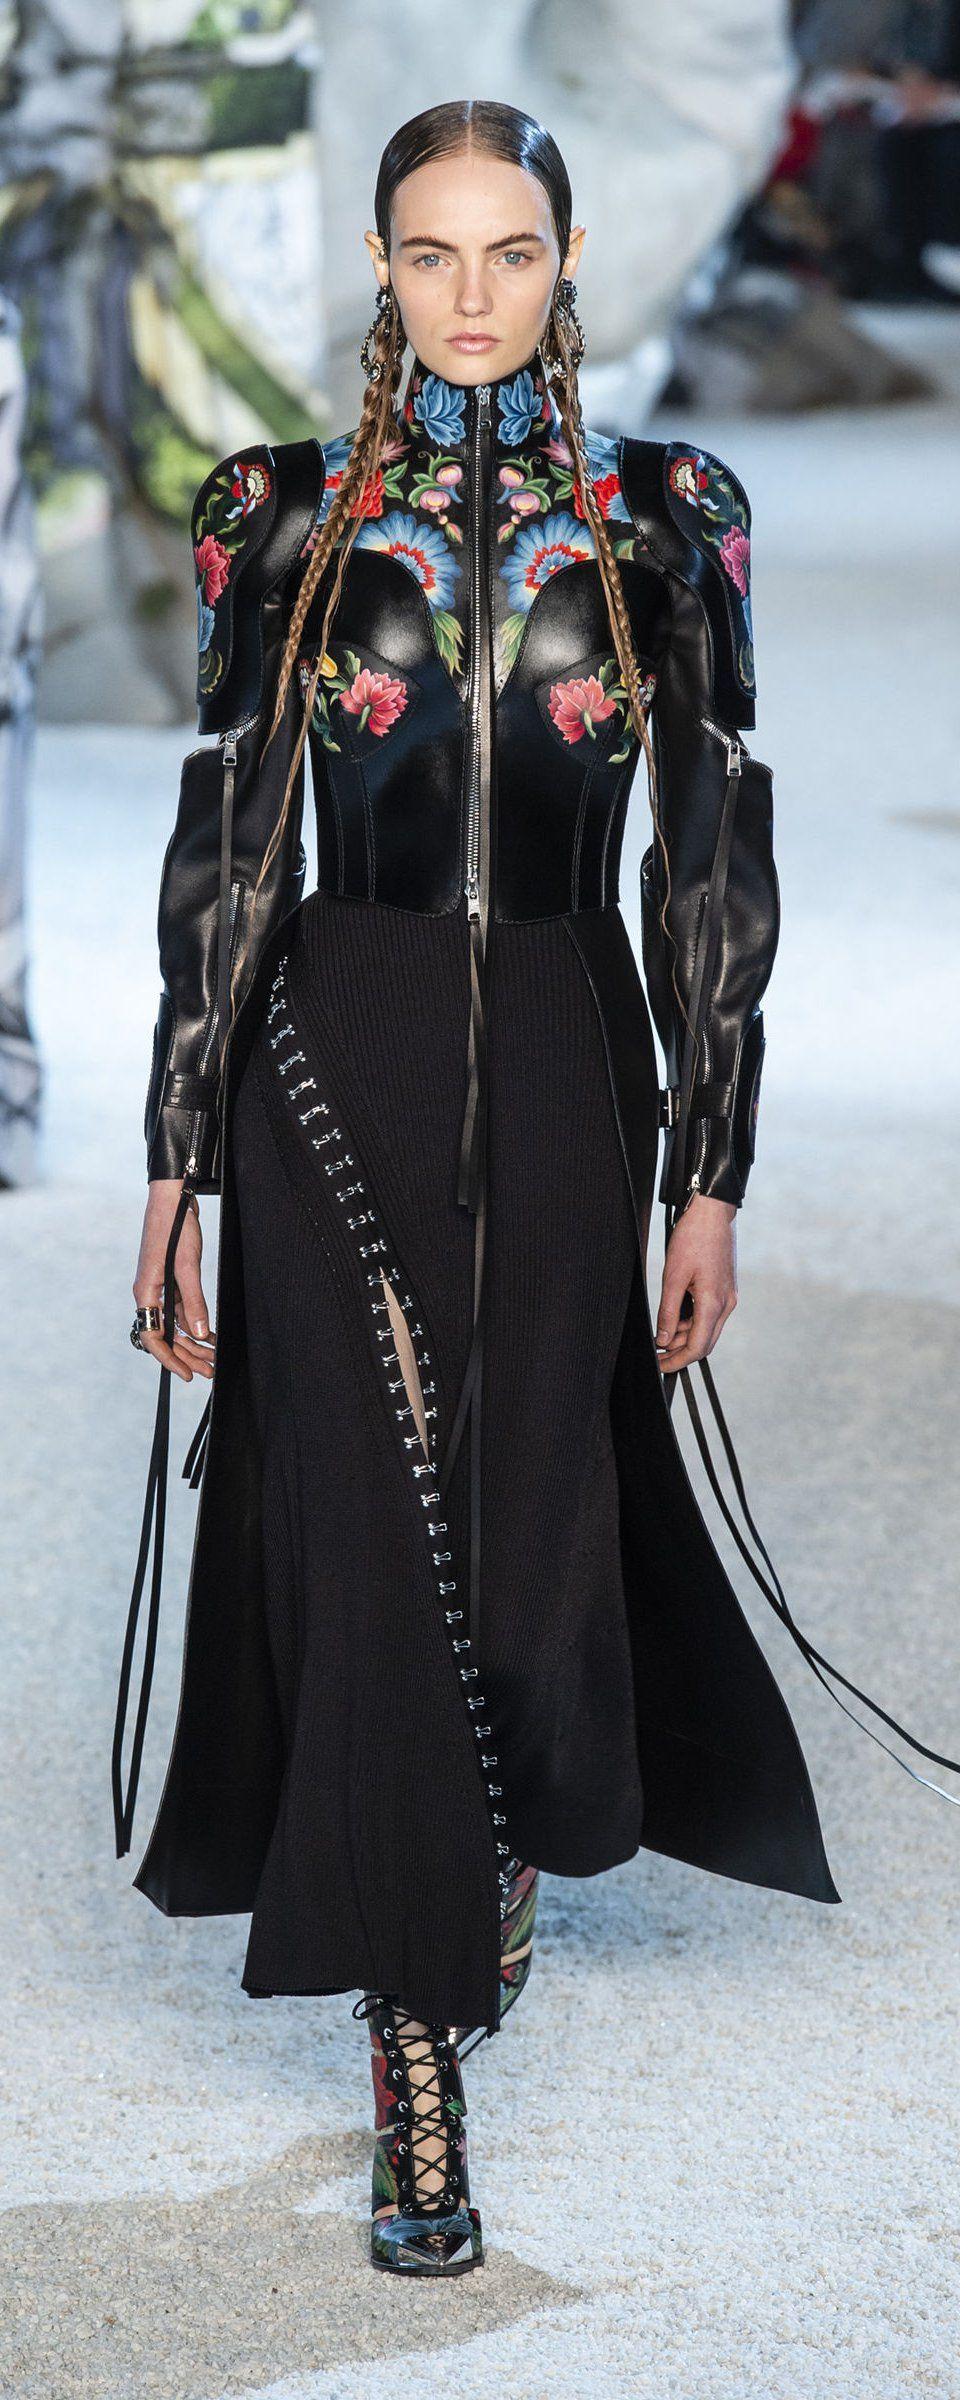 McQ by Alexander McQueen SpringSummer 2019 Collection – New York Fashion Week foto